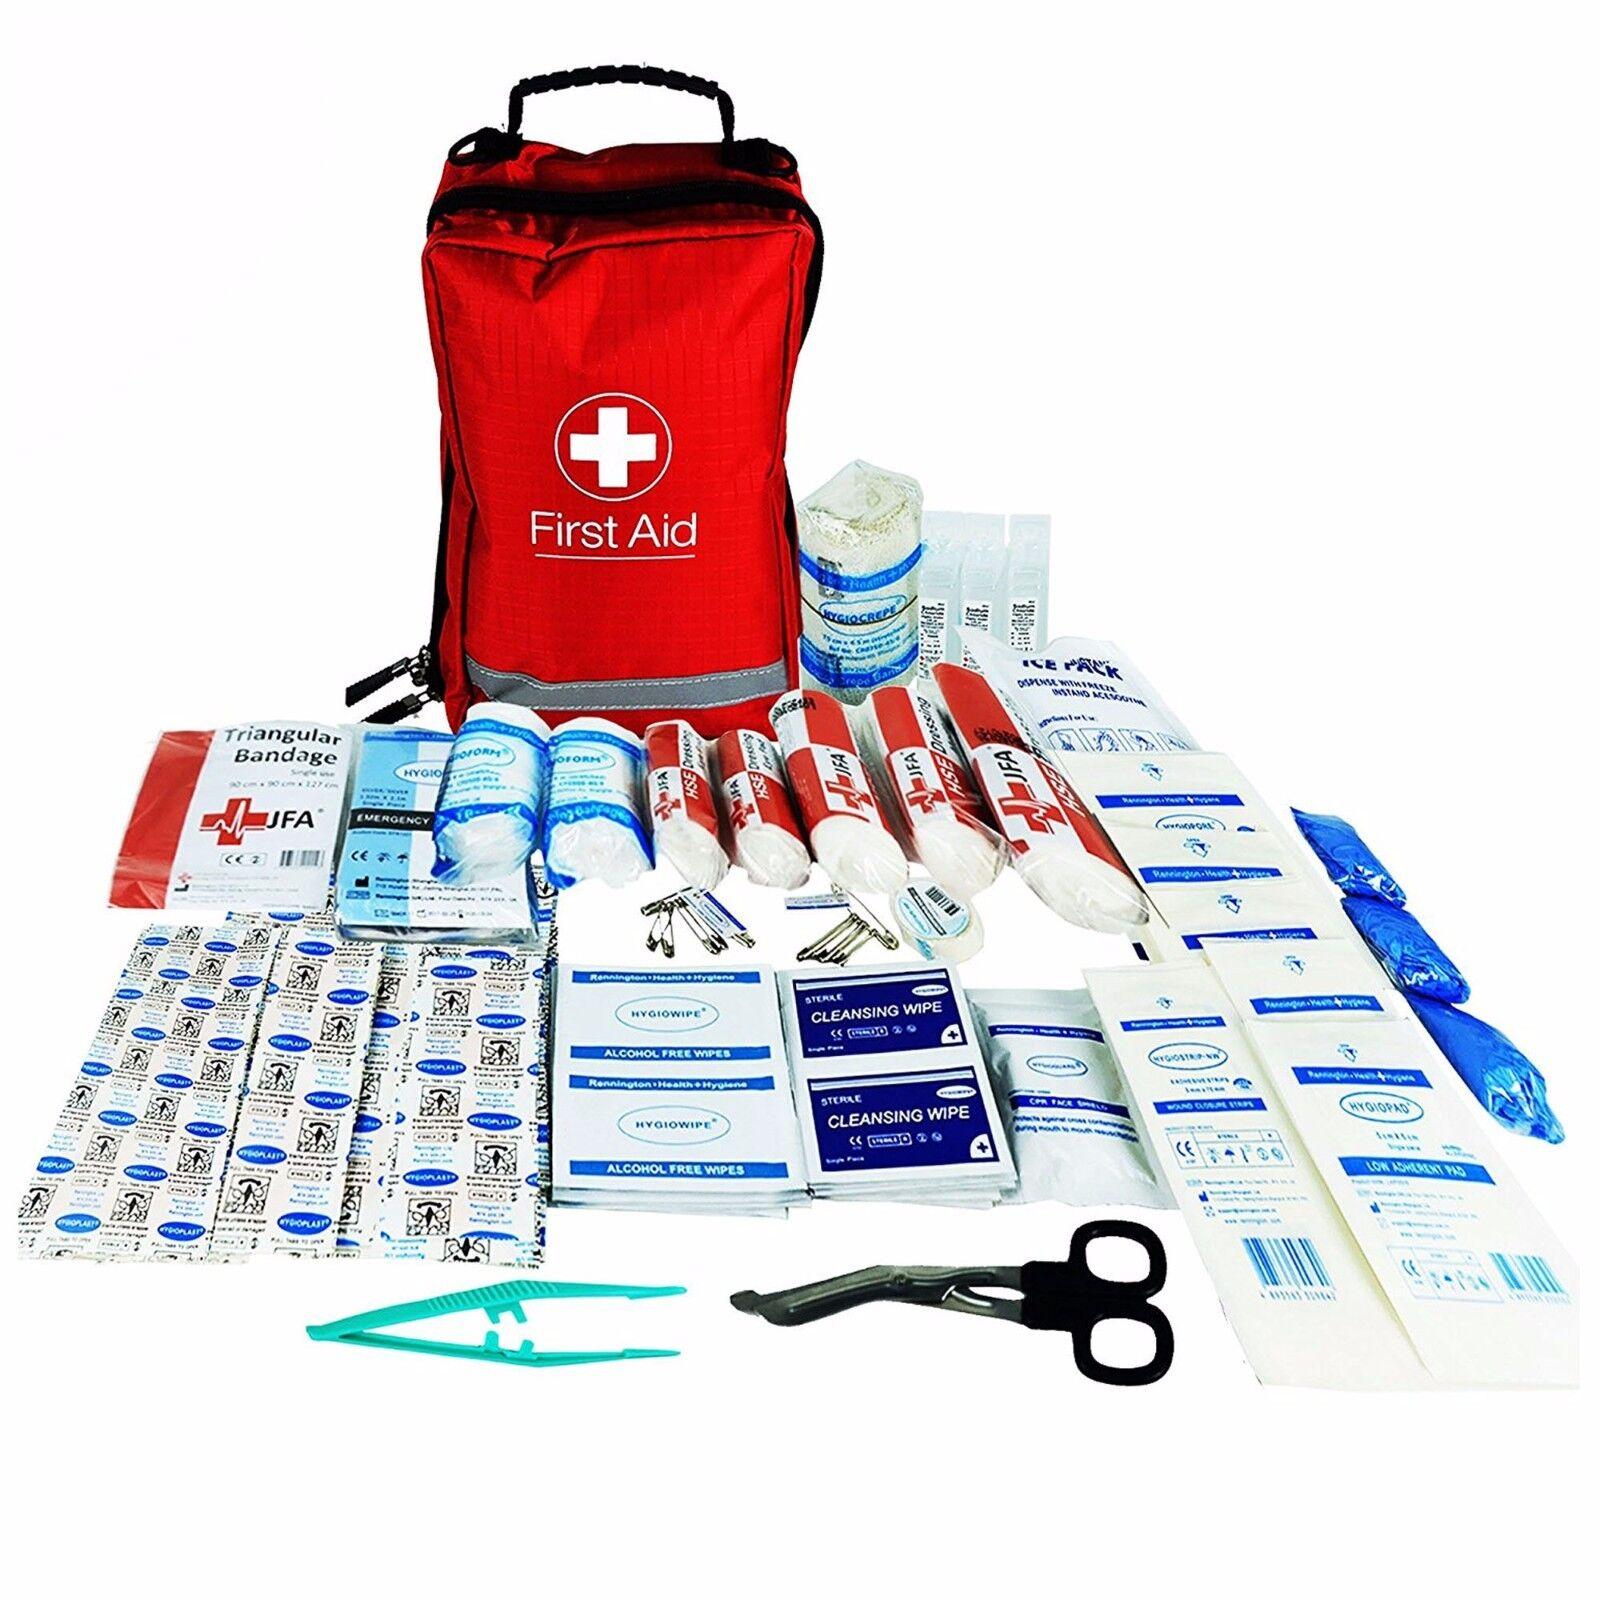 JFA 200 Piece Comprehensive First Aid Kit Bag